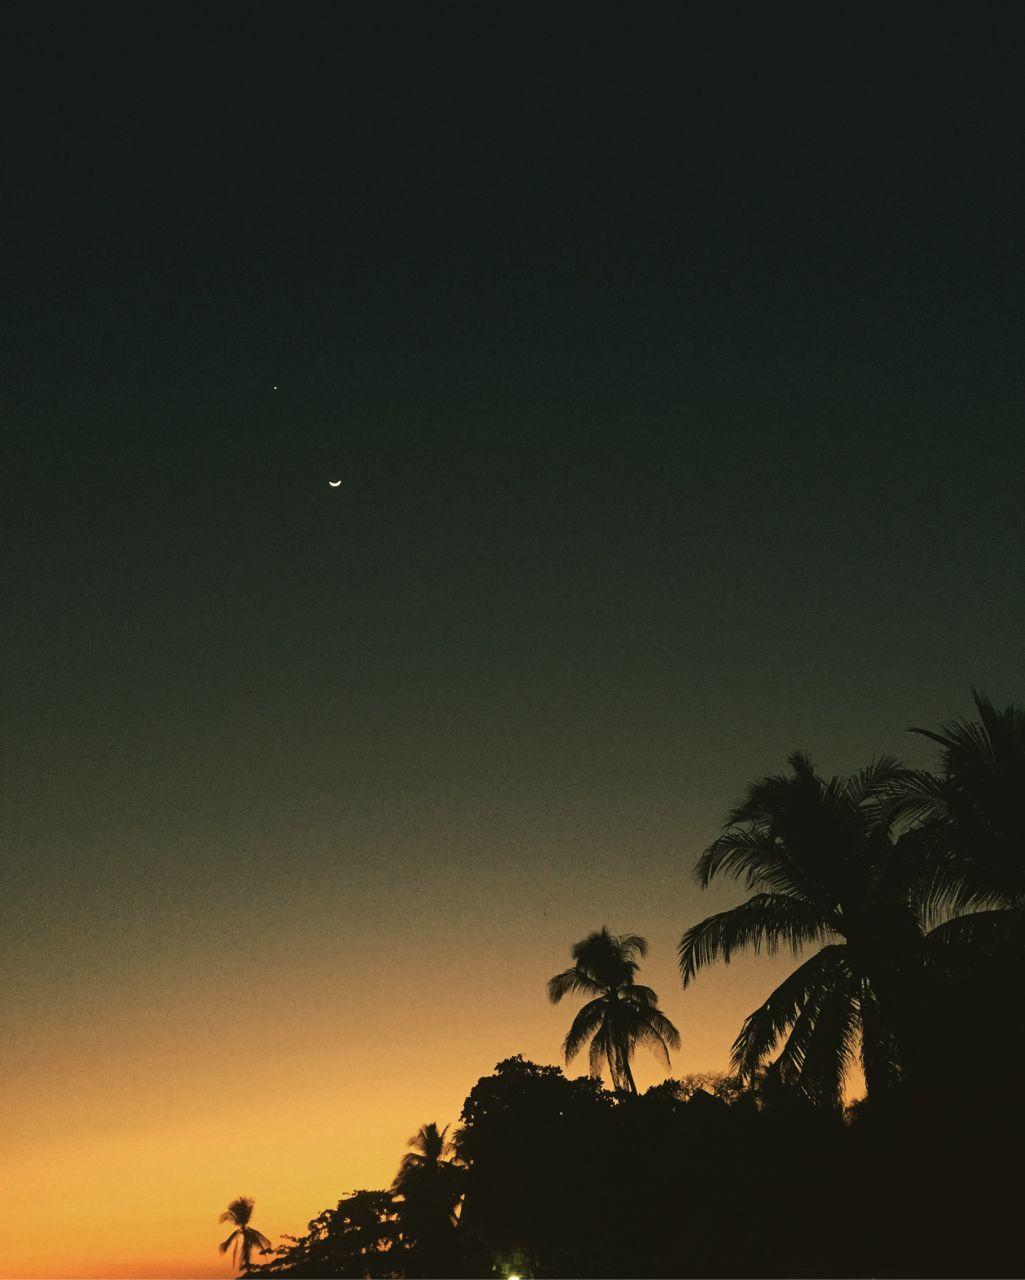 Sunset in El Zonte